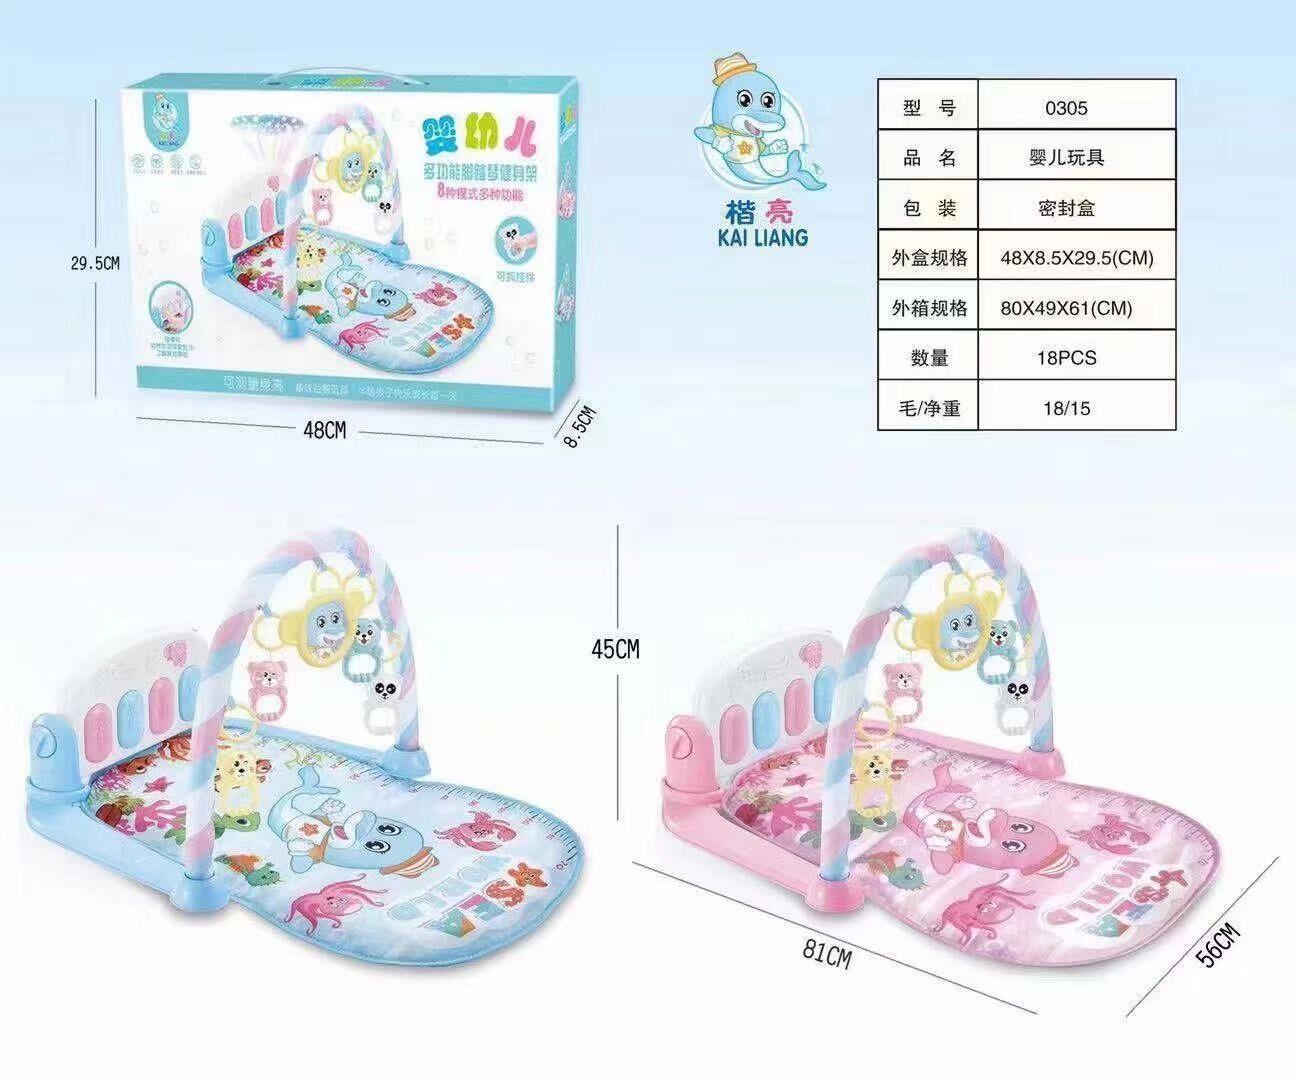 Kai Bright 0305 Infant Harmonium Music Game Blanket Baby Fitness Frame Educational Early Childhood Story Machine Toy Piano